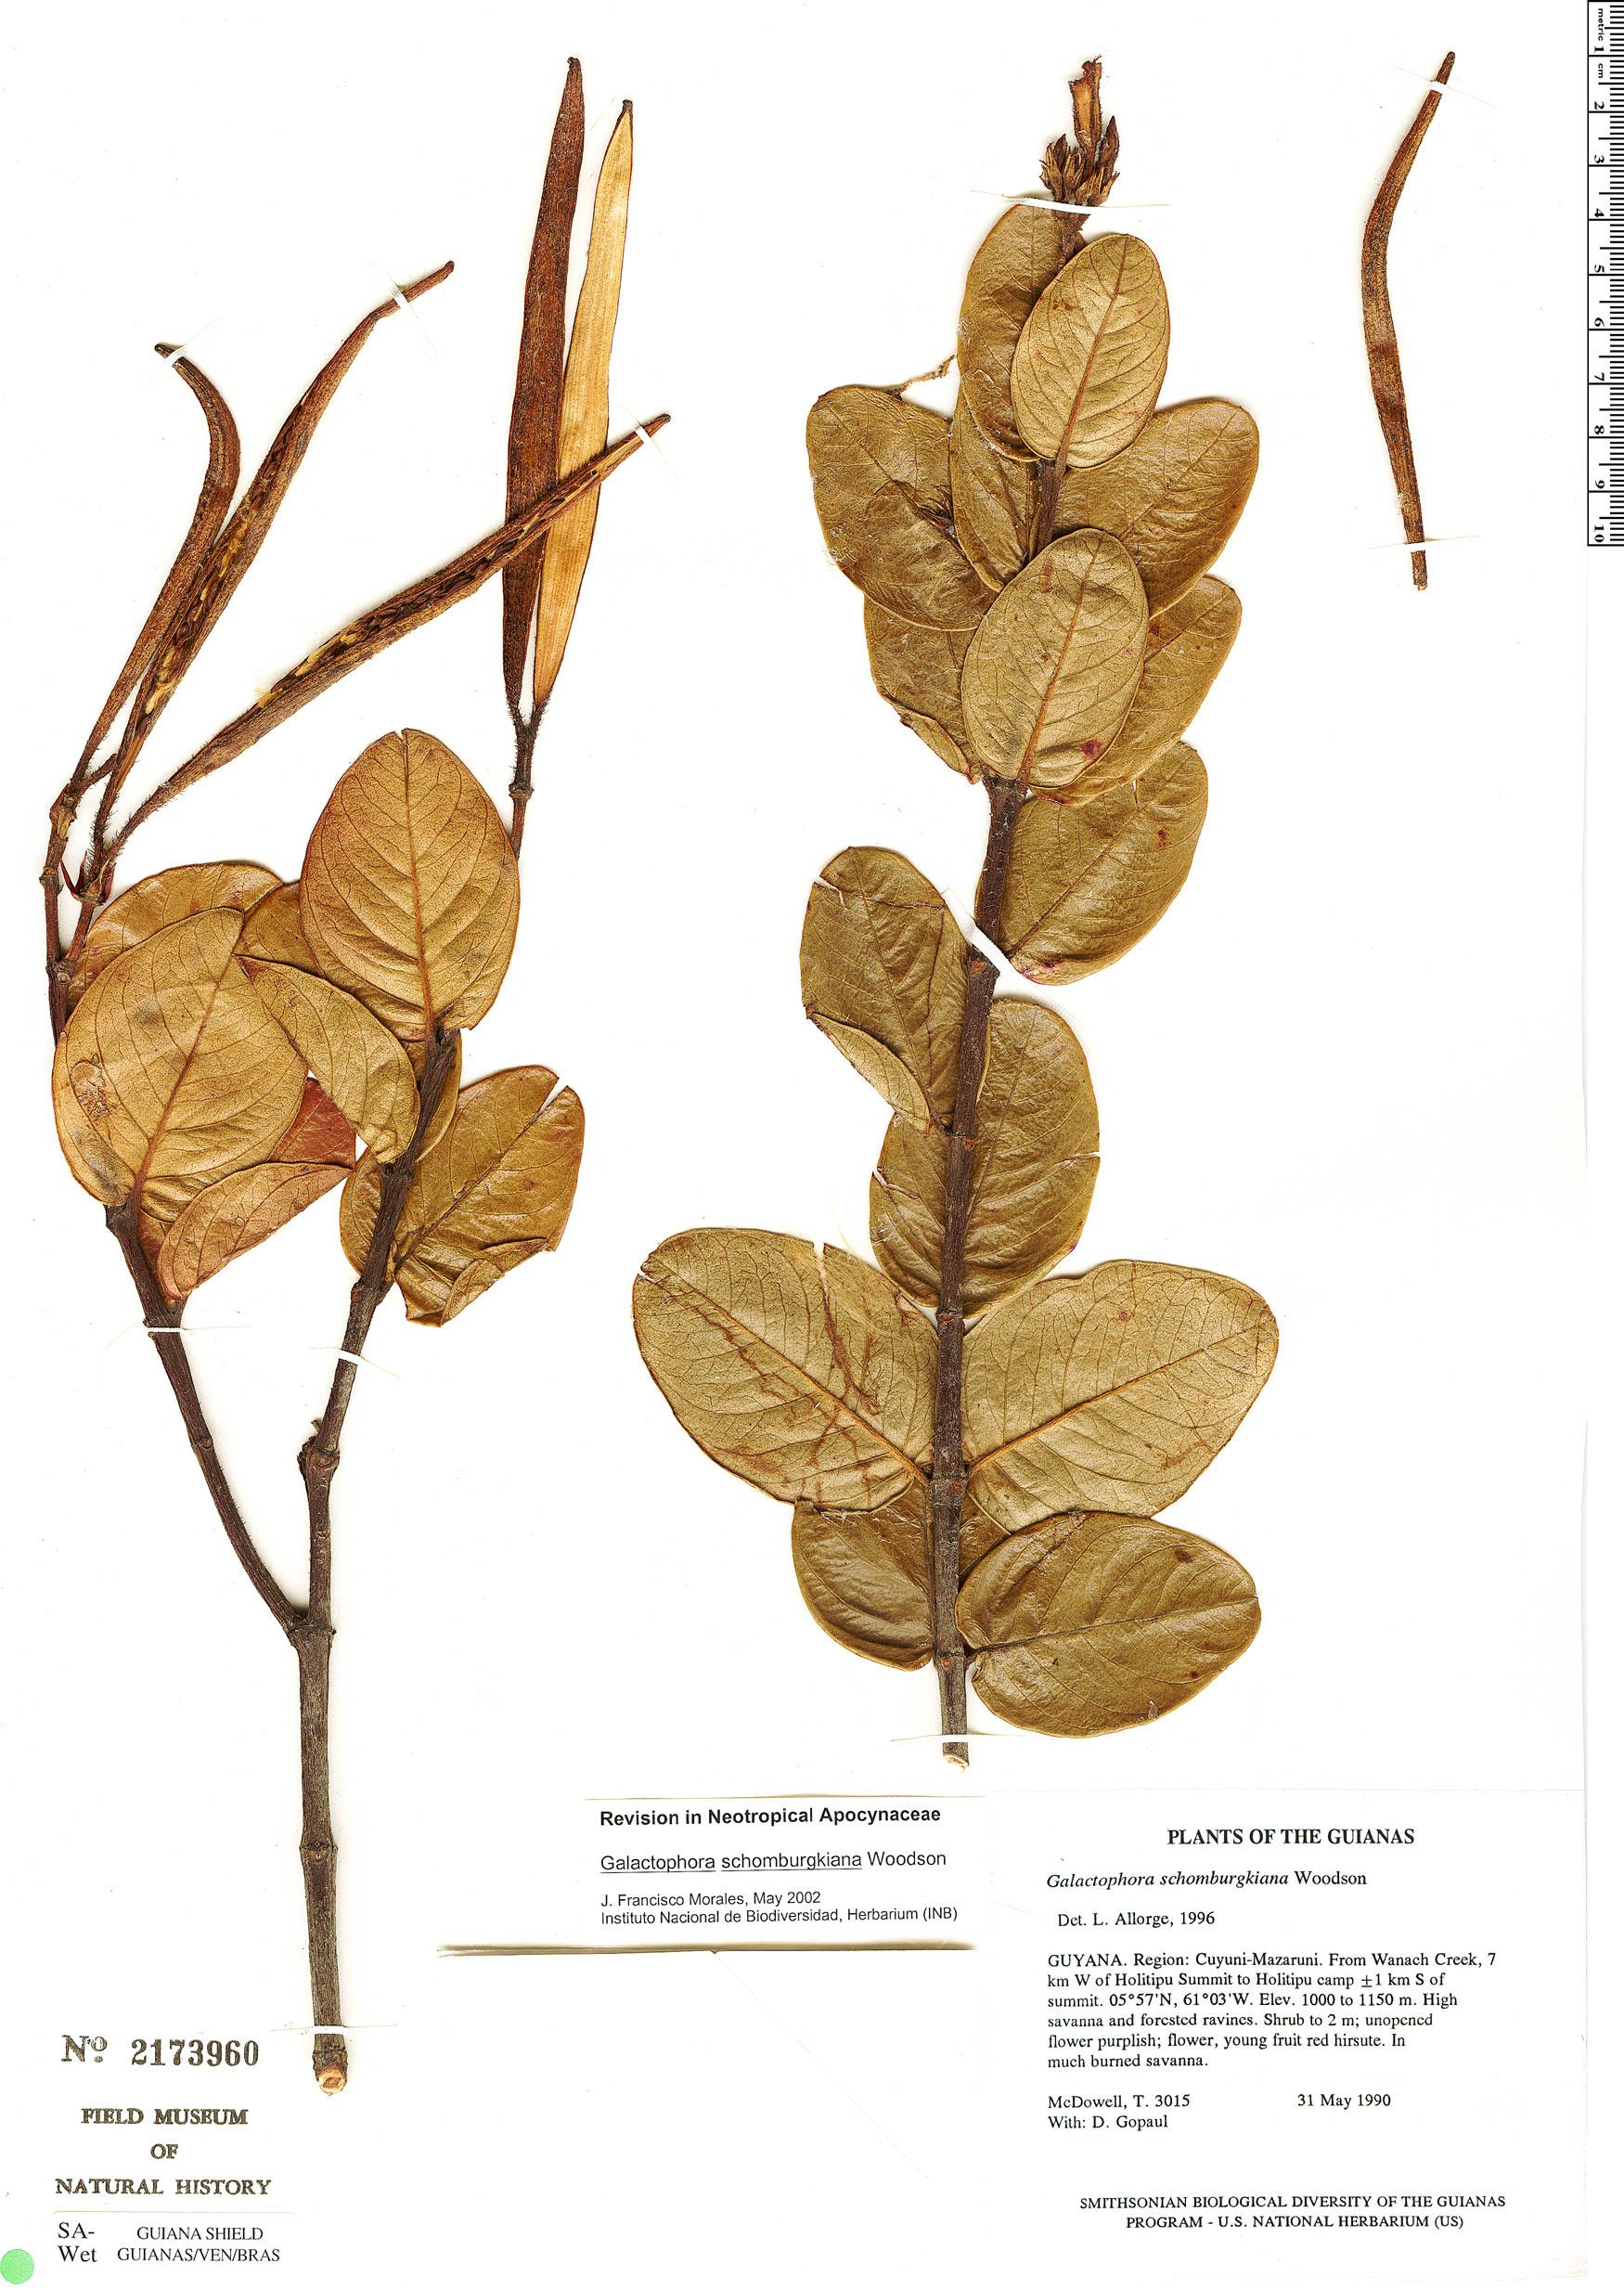 Specimen: Galactophora schomburgkiana